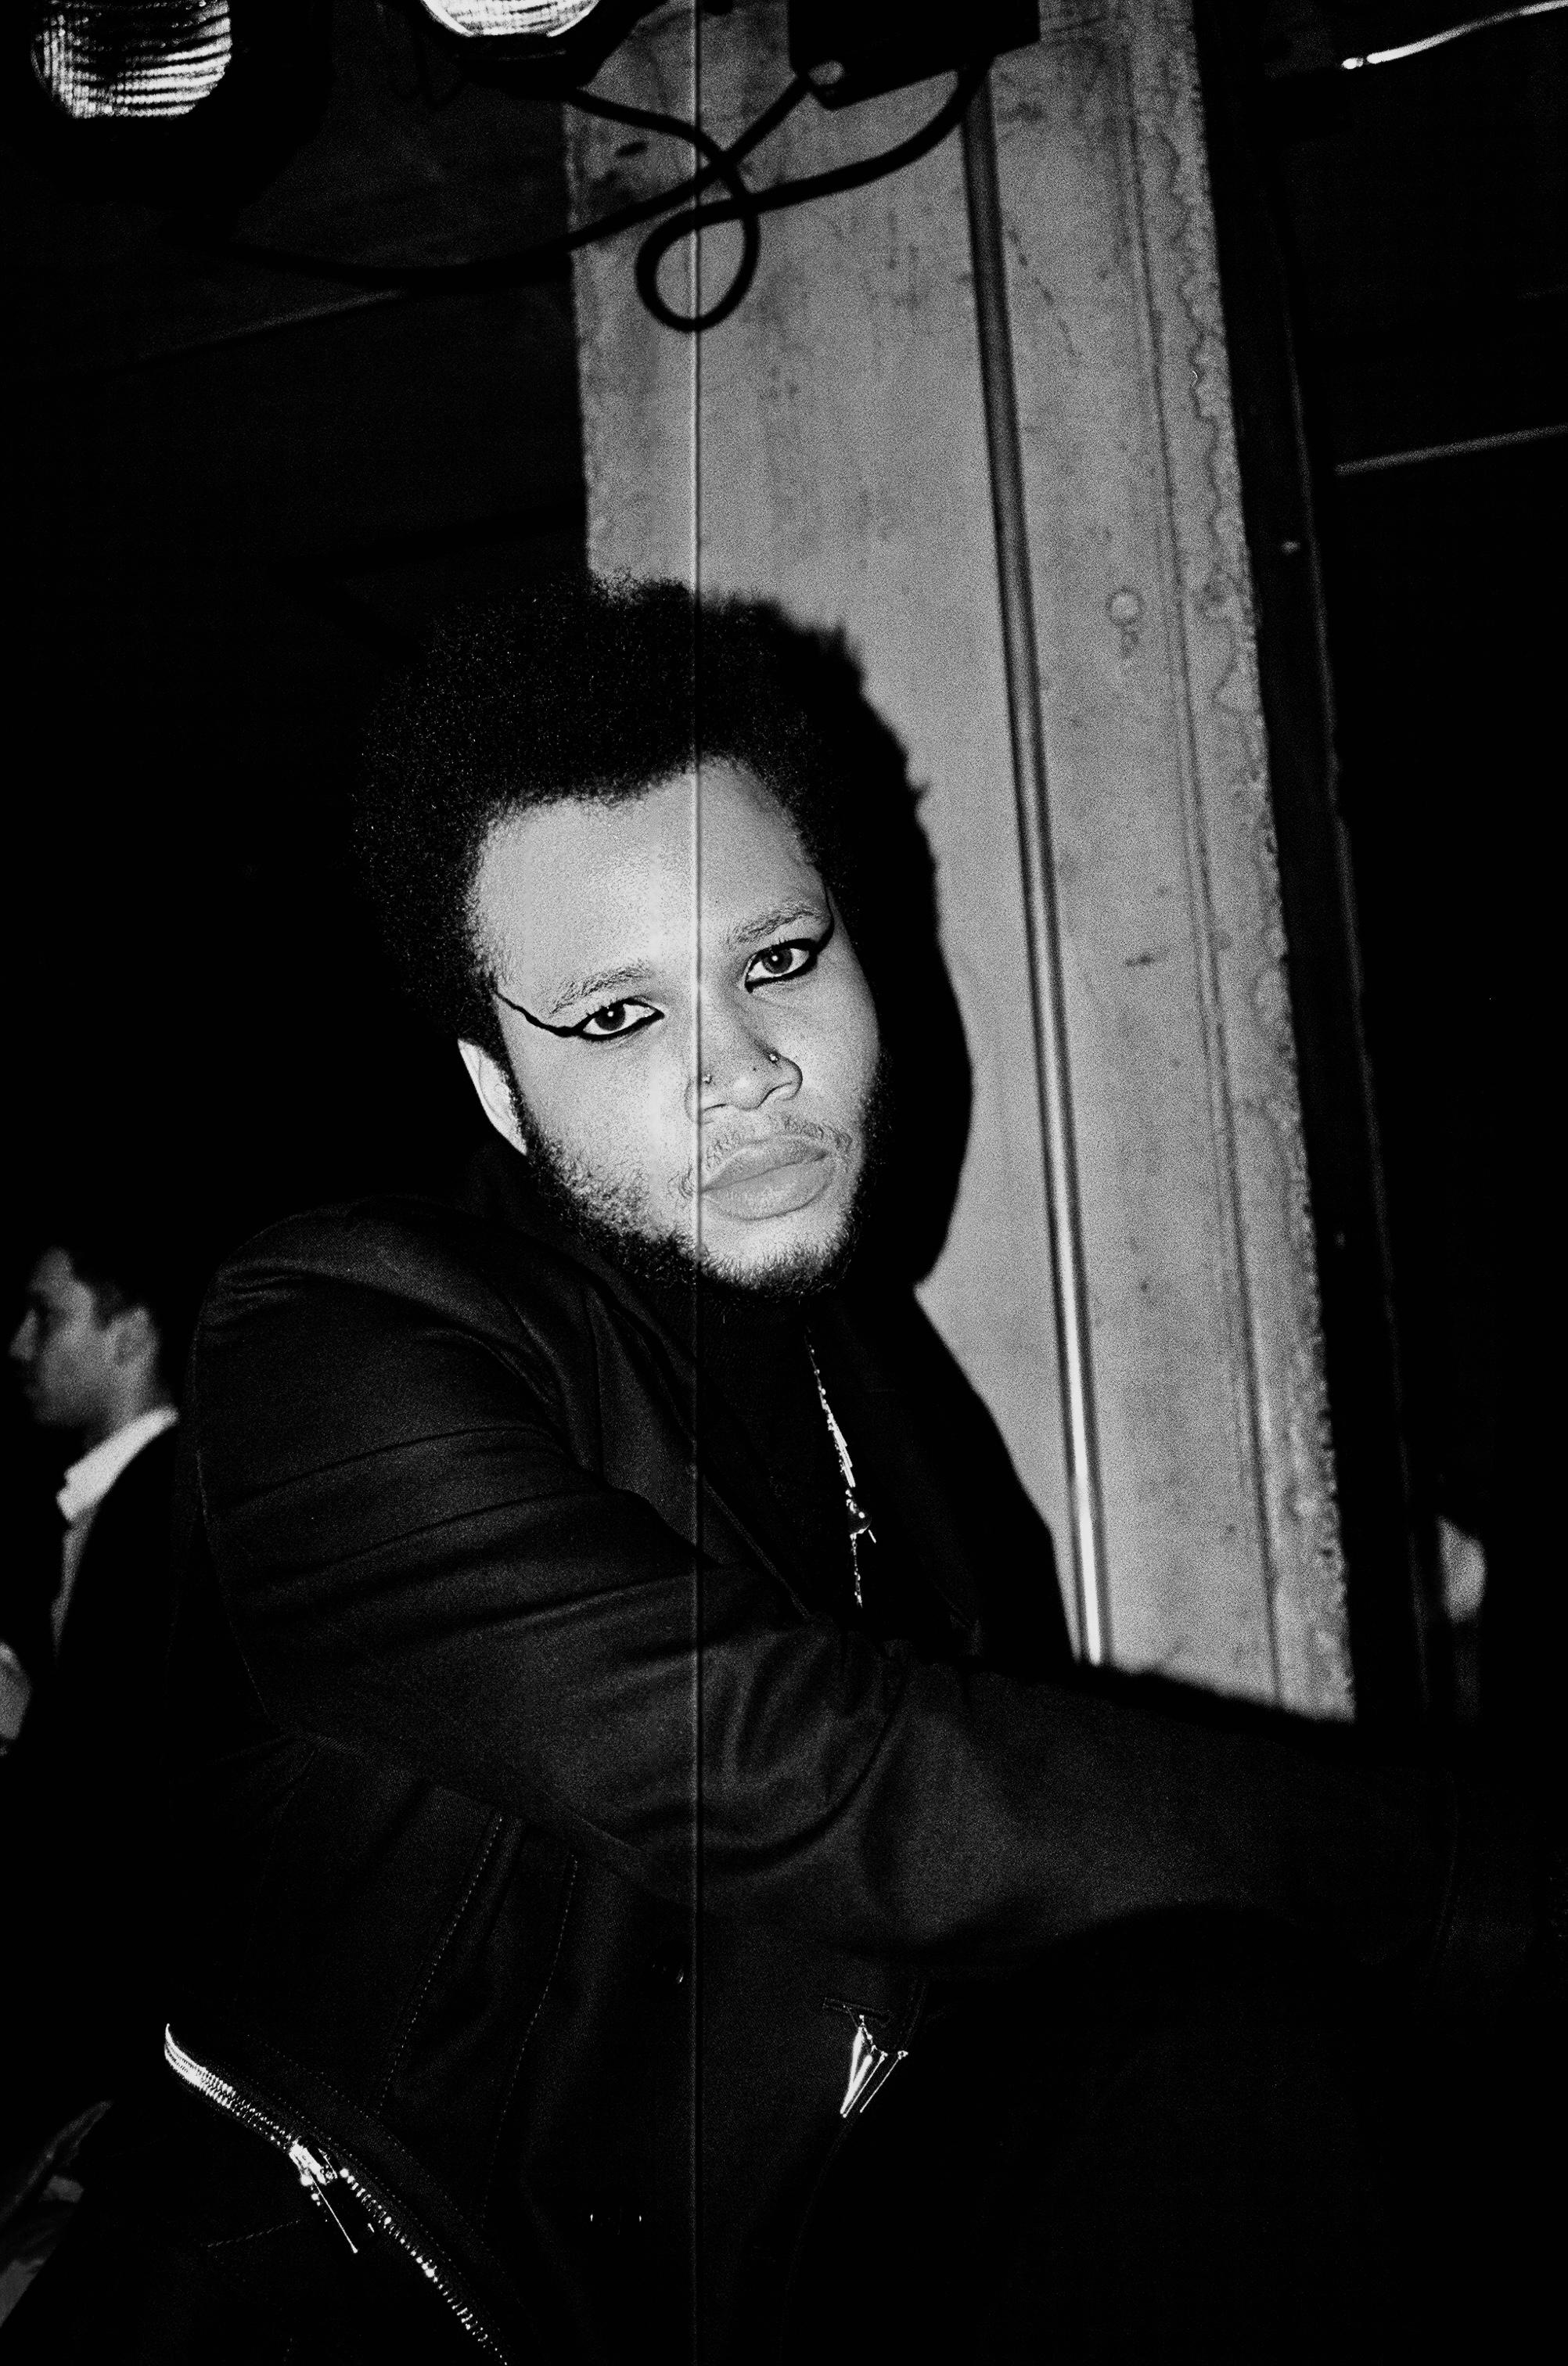 NEW YORK 19' Ph: Isaiah Alan